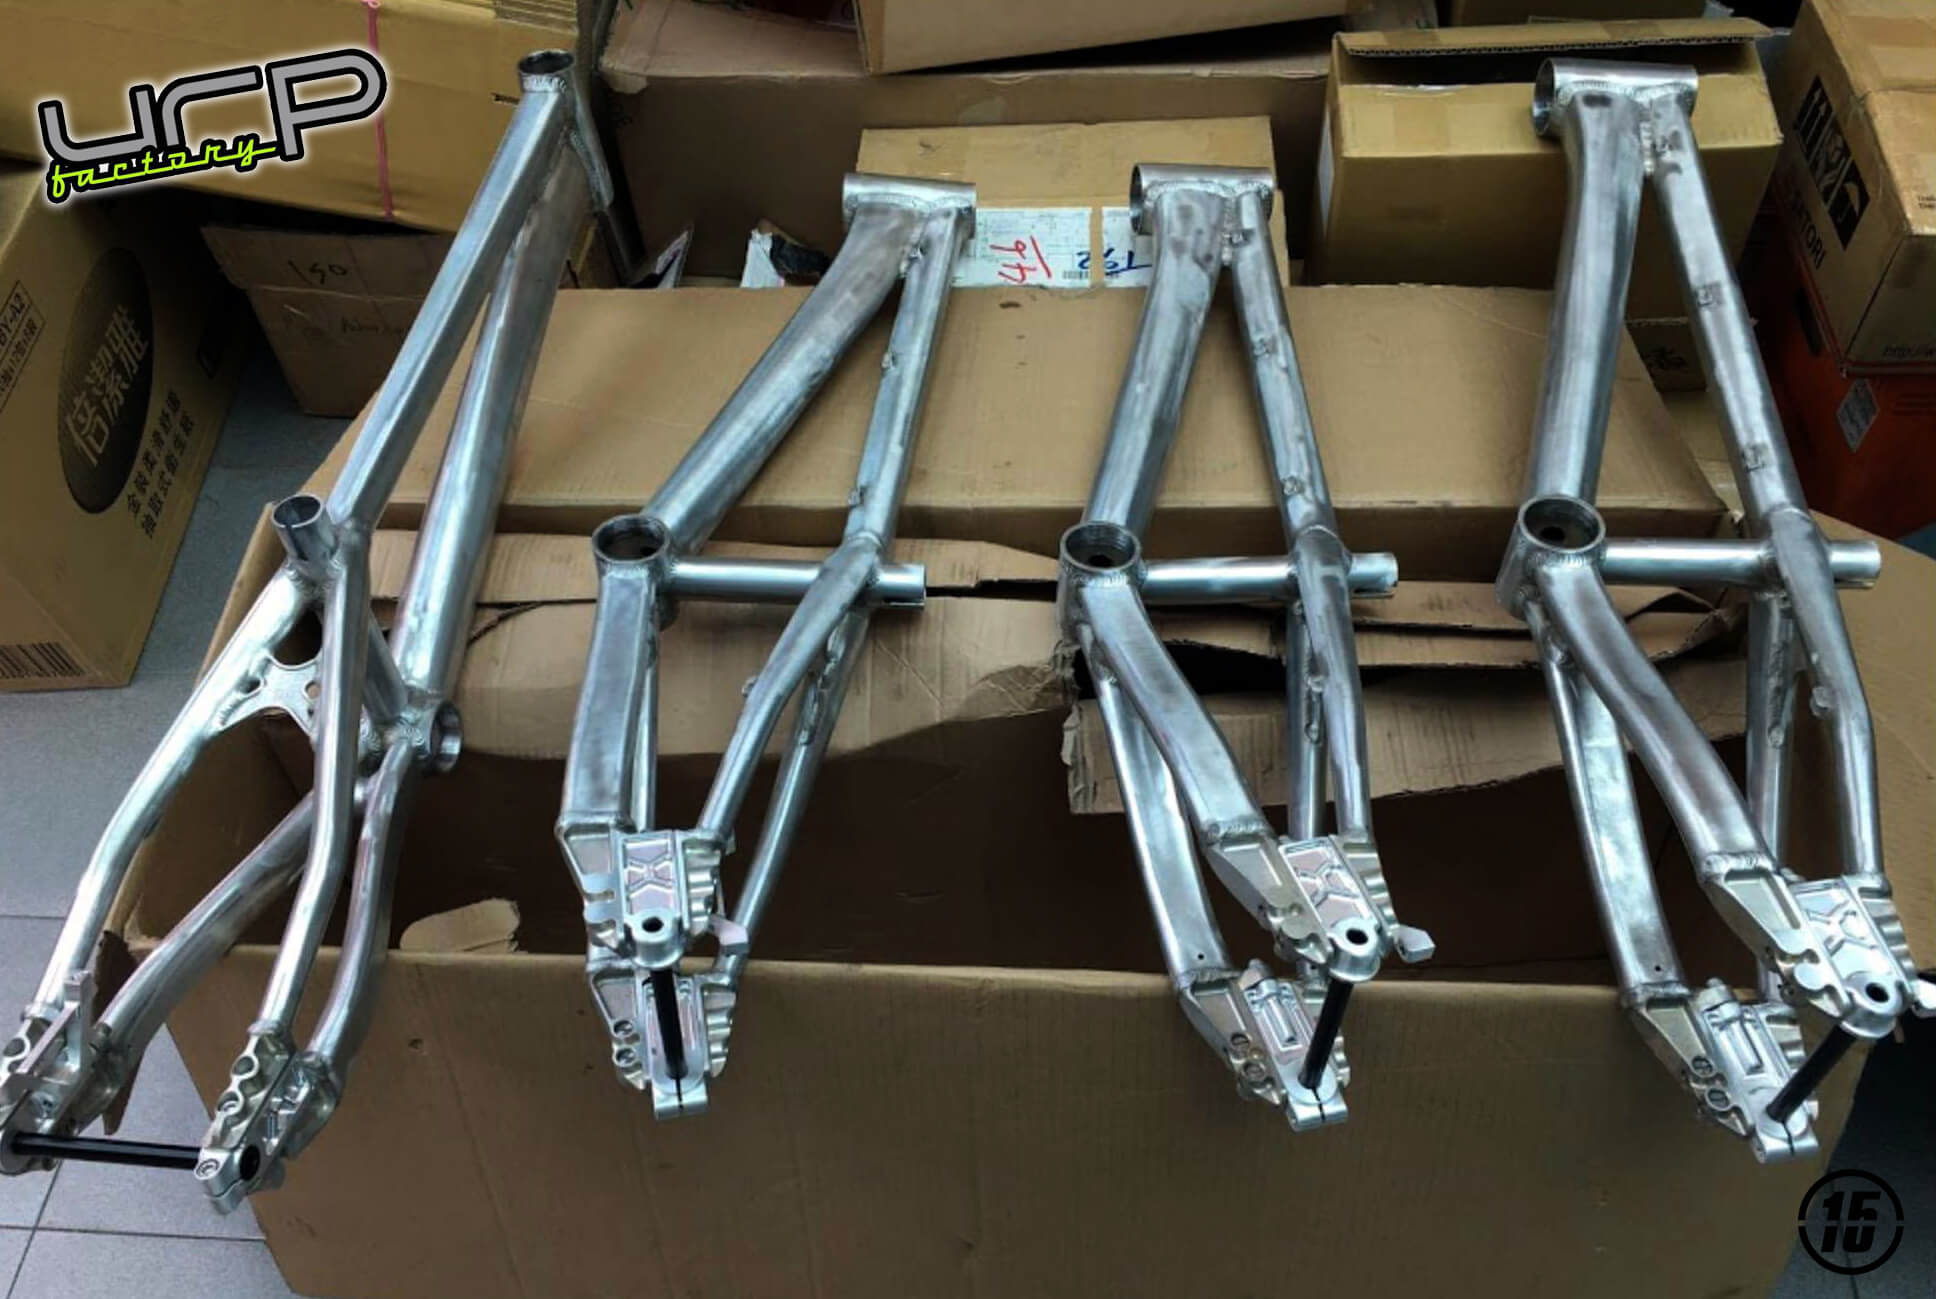 urp-motoV1-prototype-frame